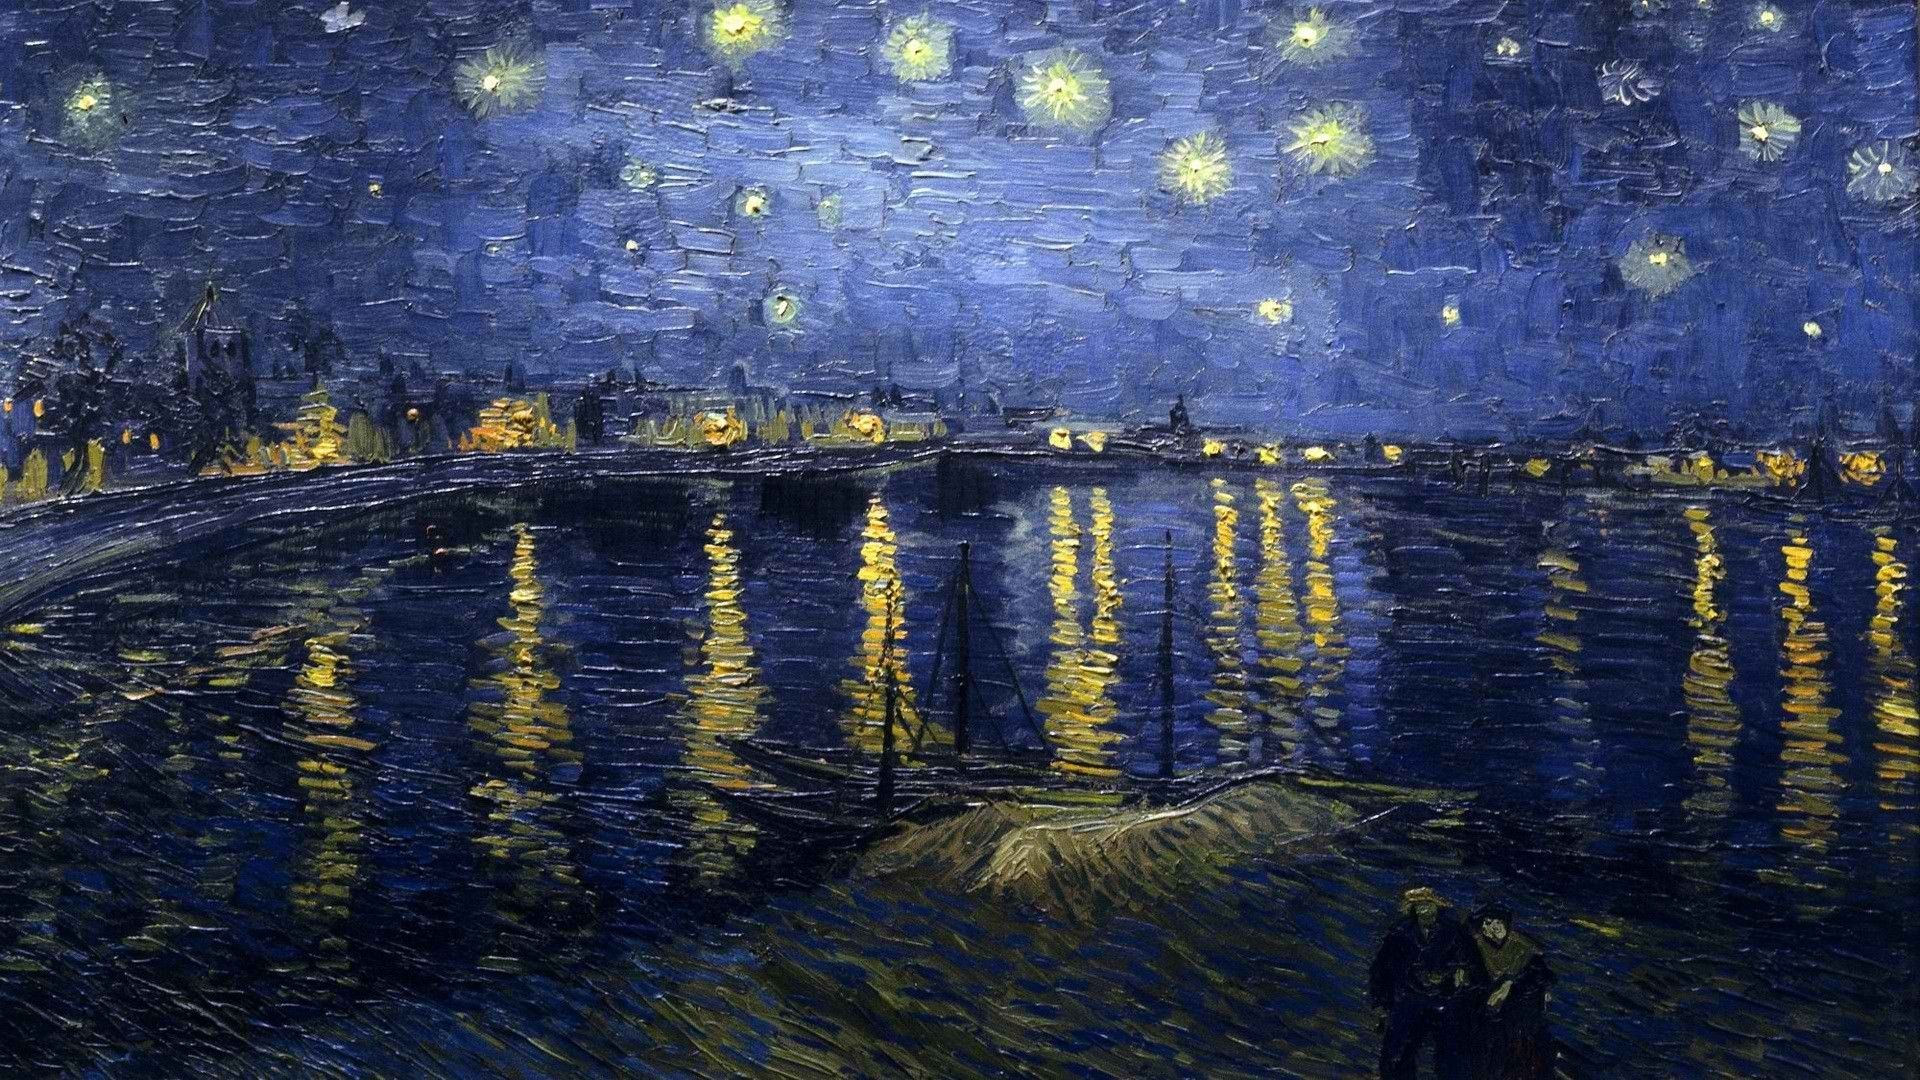 night world vincent van gogh starry night over the rhone 1920x1080 wallpaper art hd wallpaper